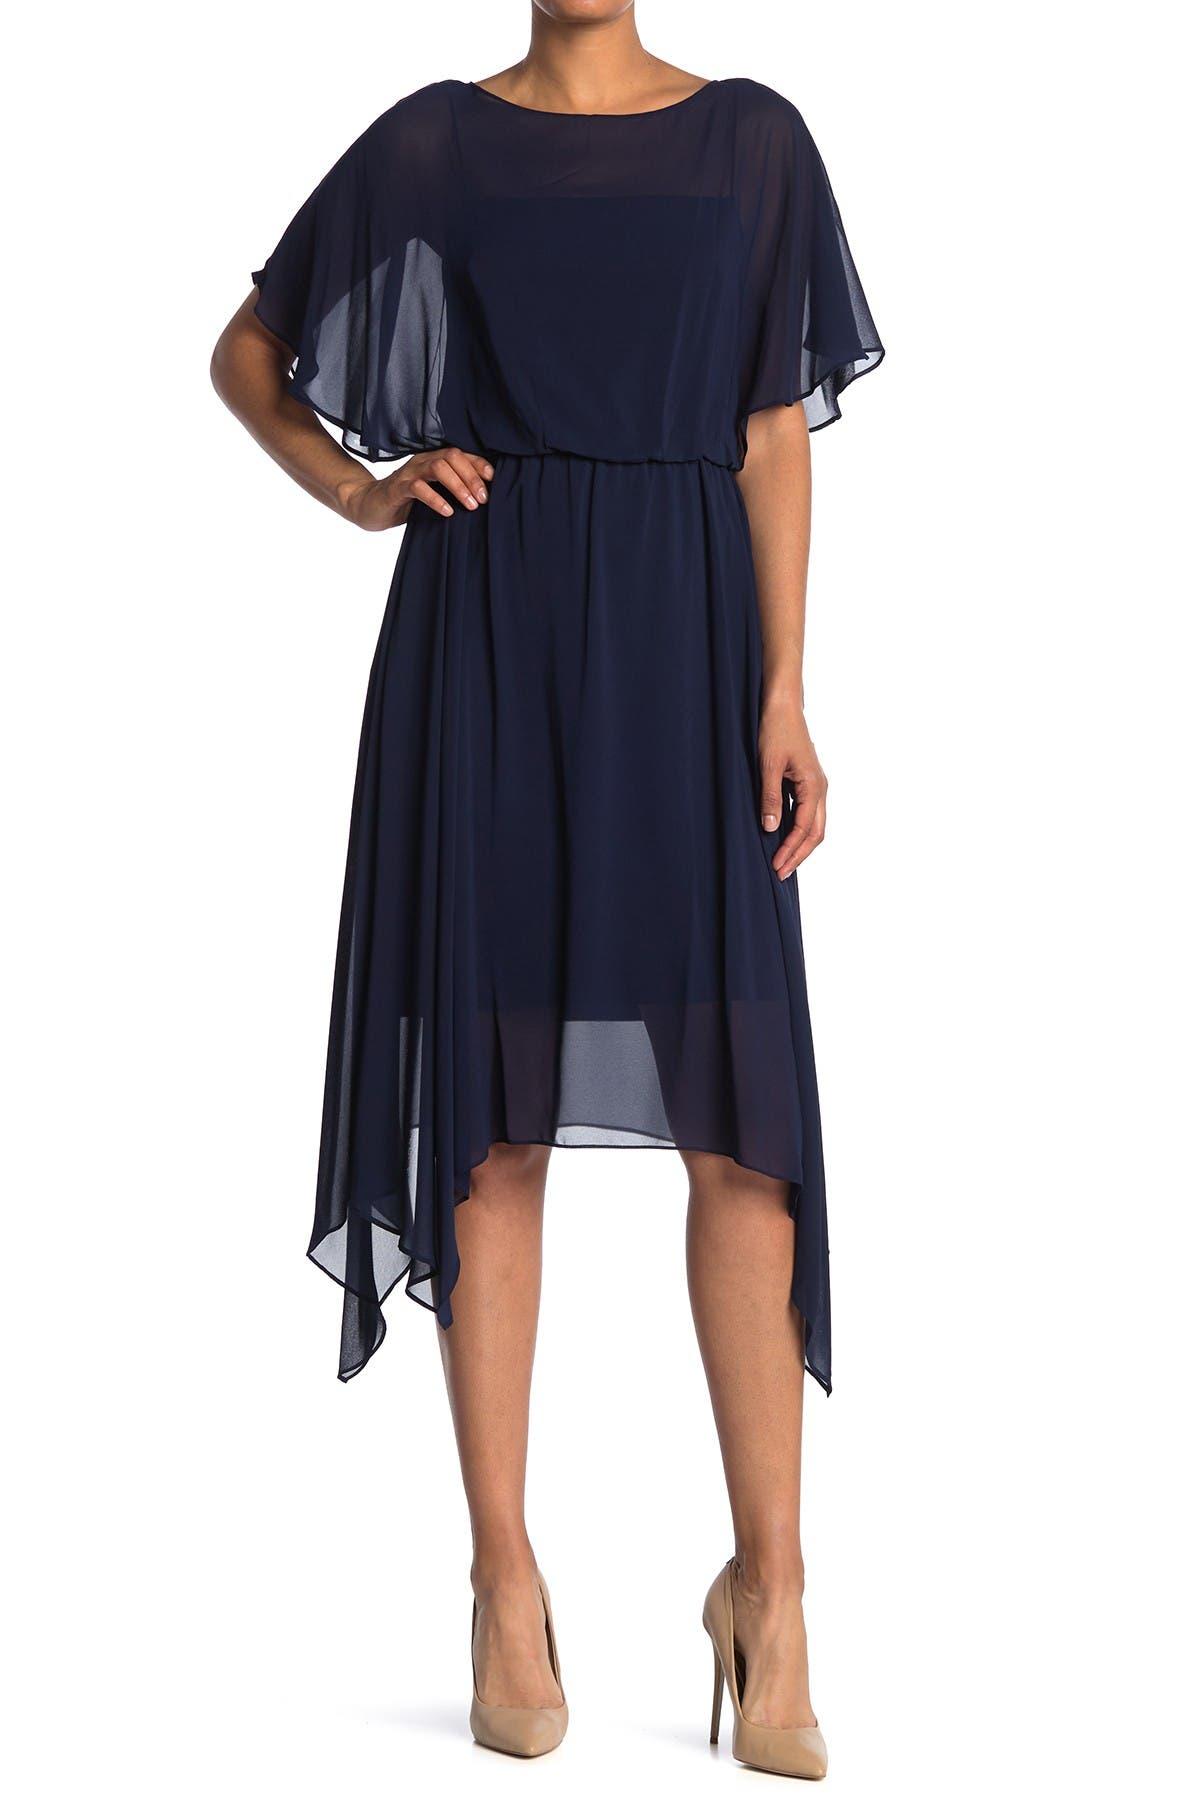 Image of Adrianna Papell Chiffon Popover Asymmetrical Hem Dress